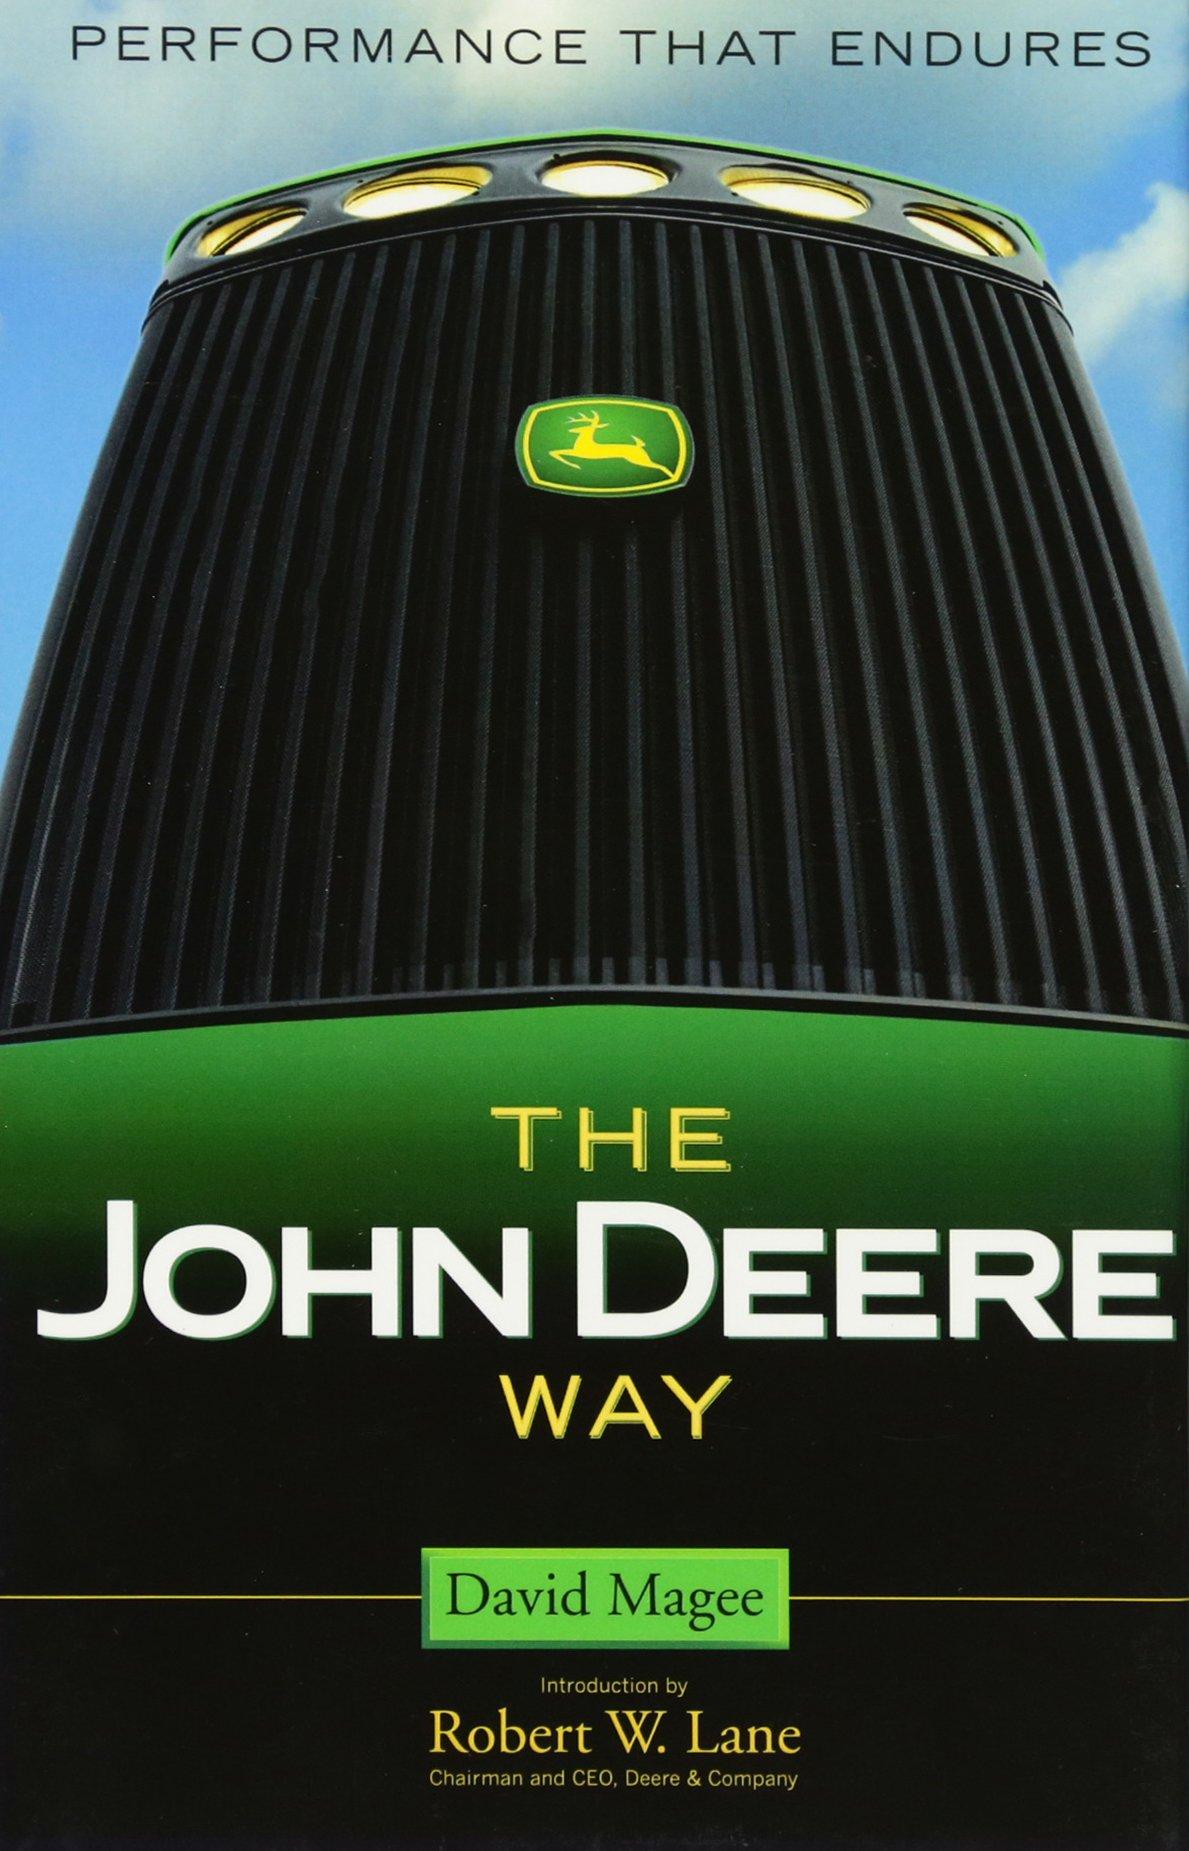 The John Deere Way: Performance That Endures: David Magee: 9780471706441:  Amazon: Books